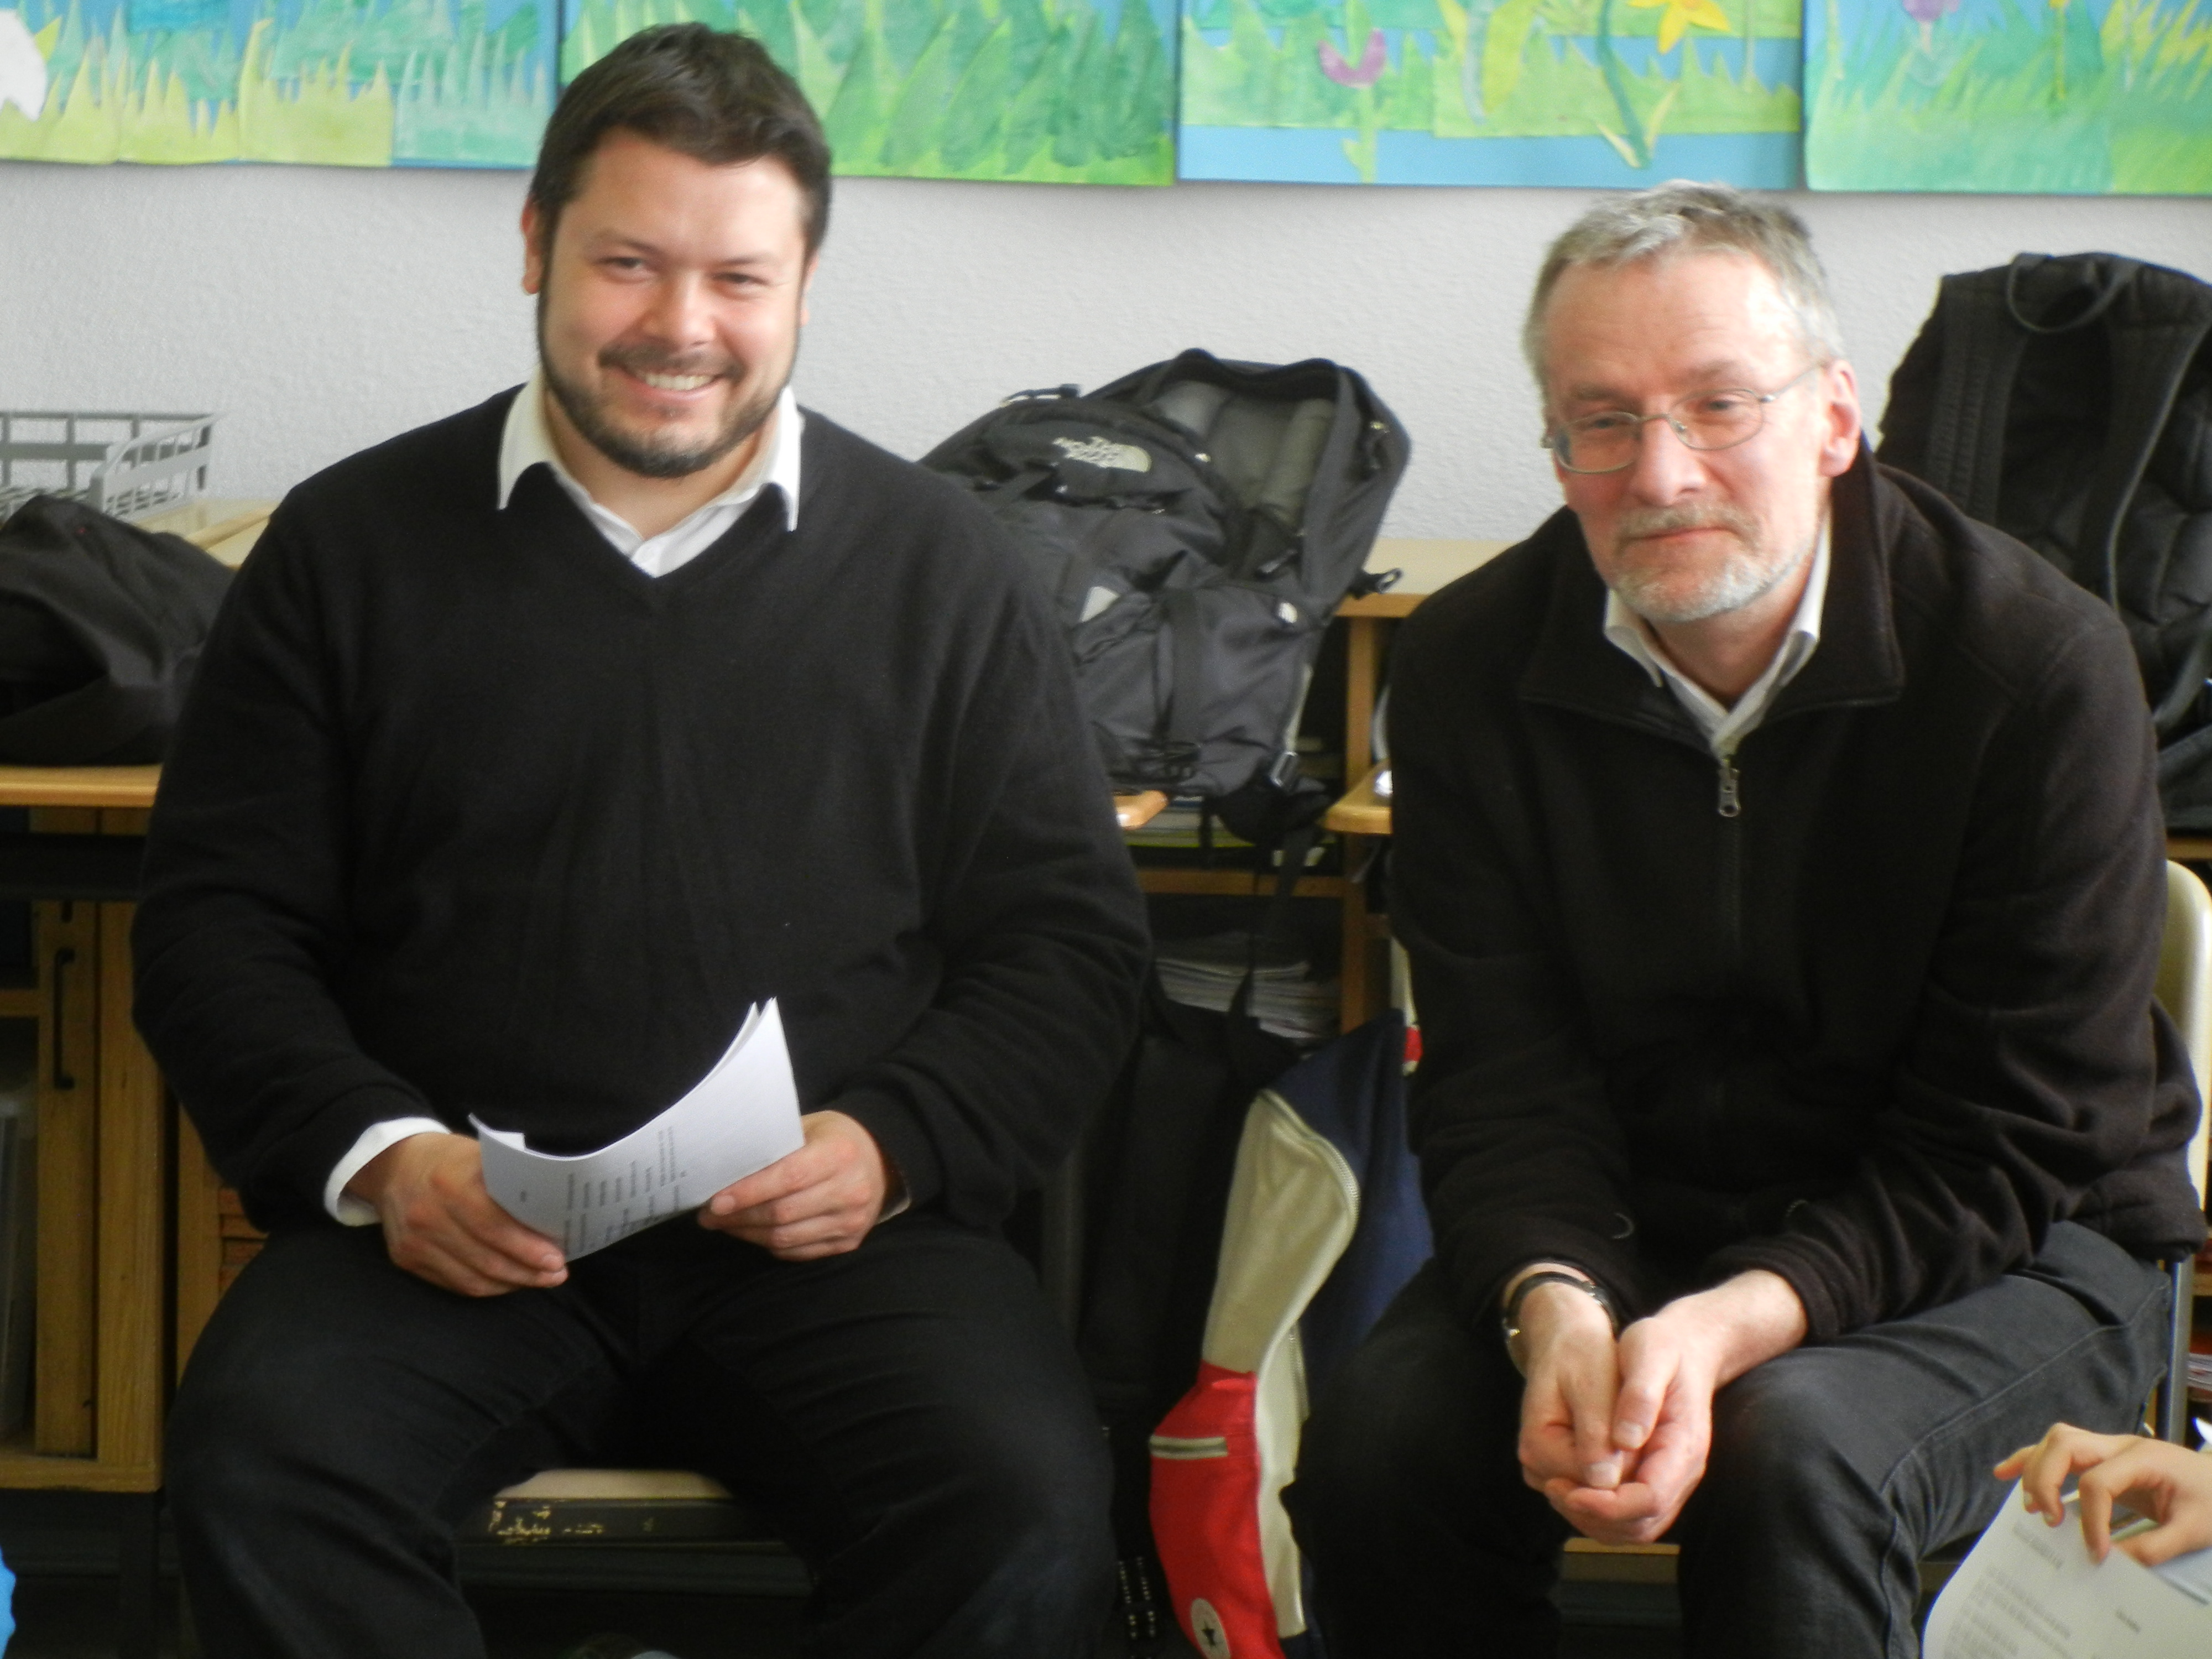 Vineta-Schule, 20.04.2016